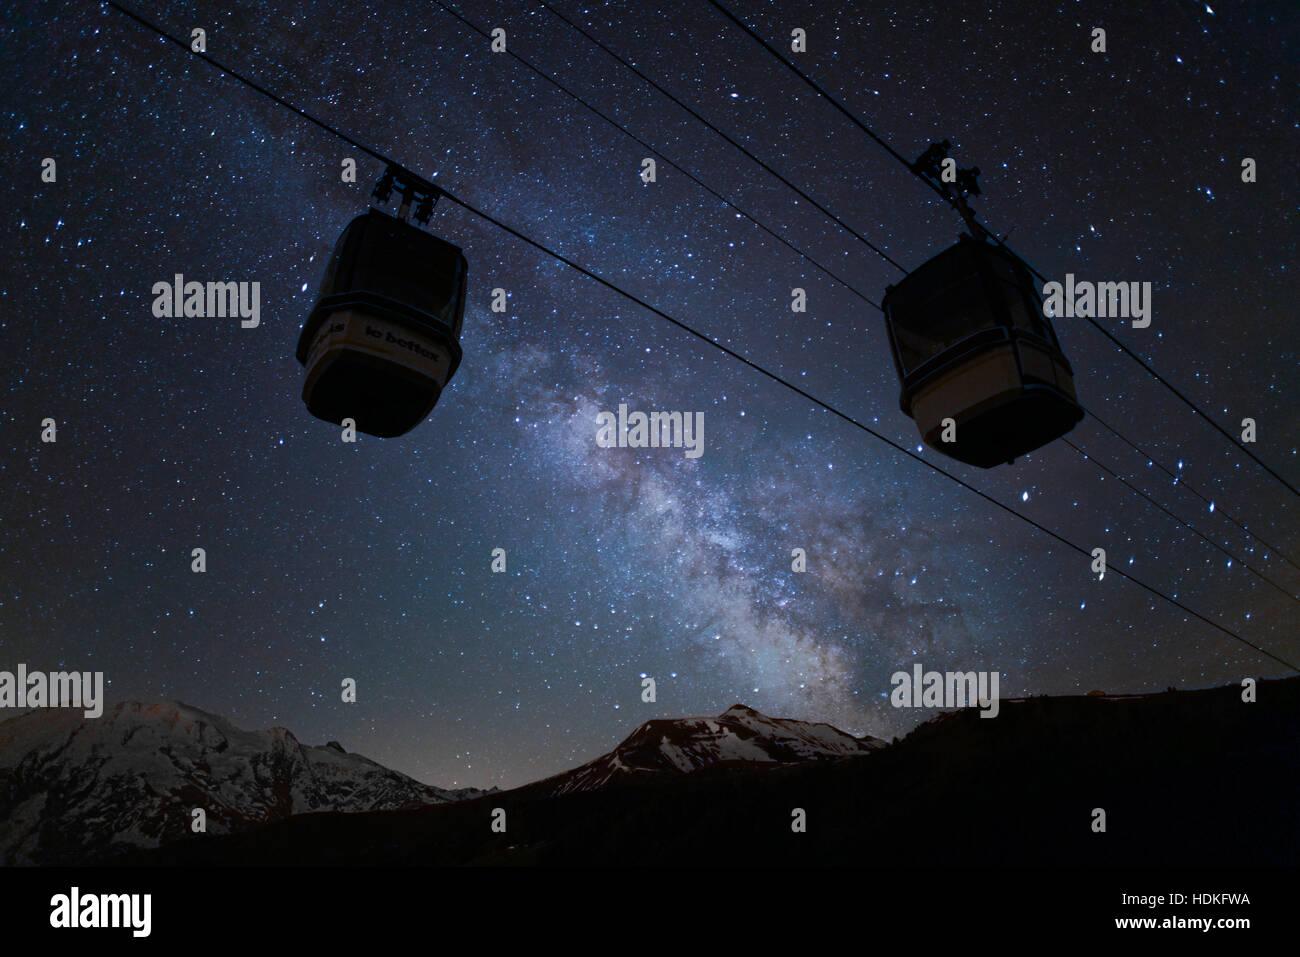 Ski resort of Saint Gervais Mont Blanc by night - Stock Image